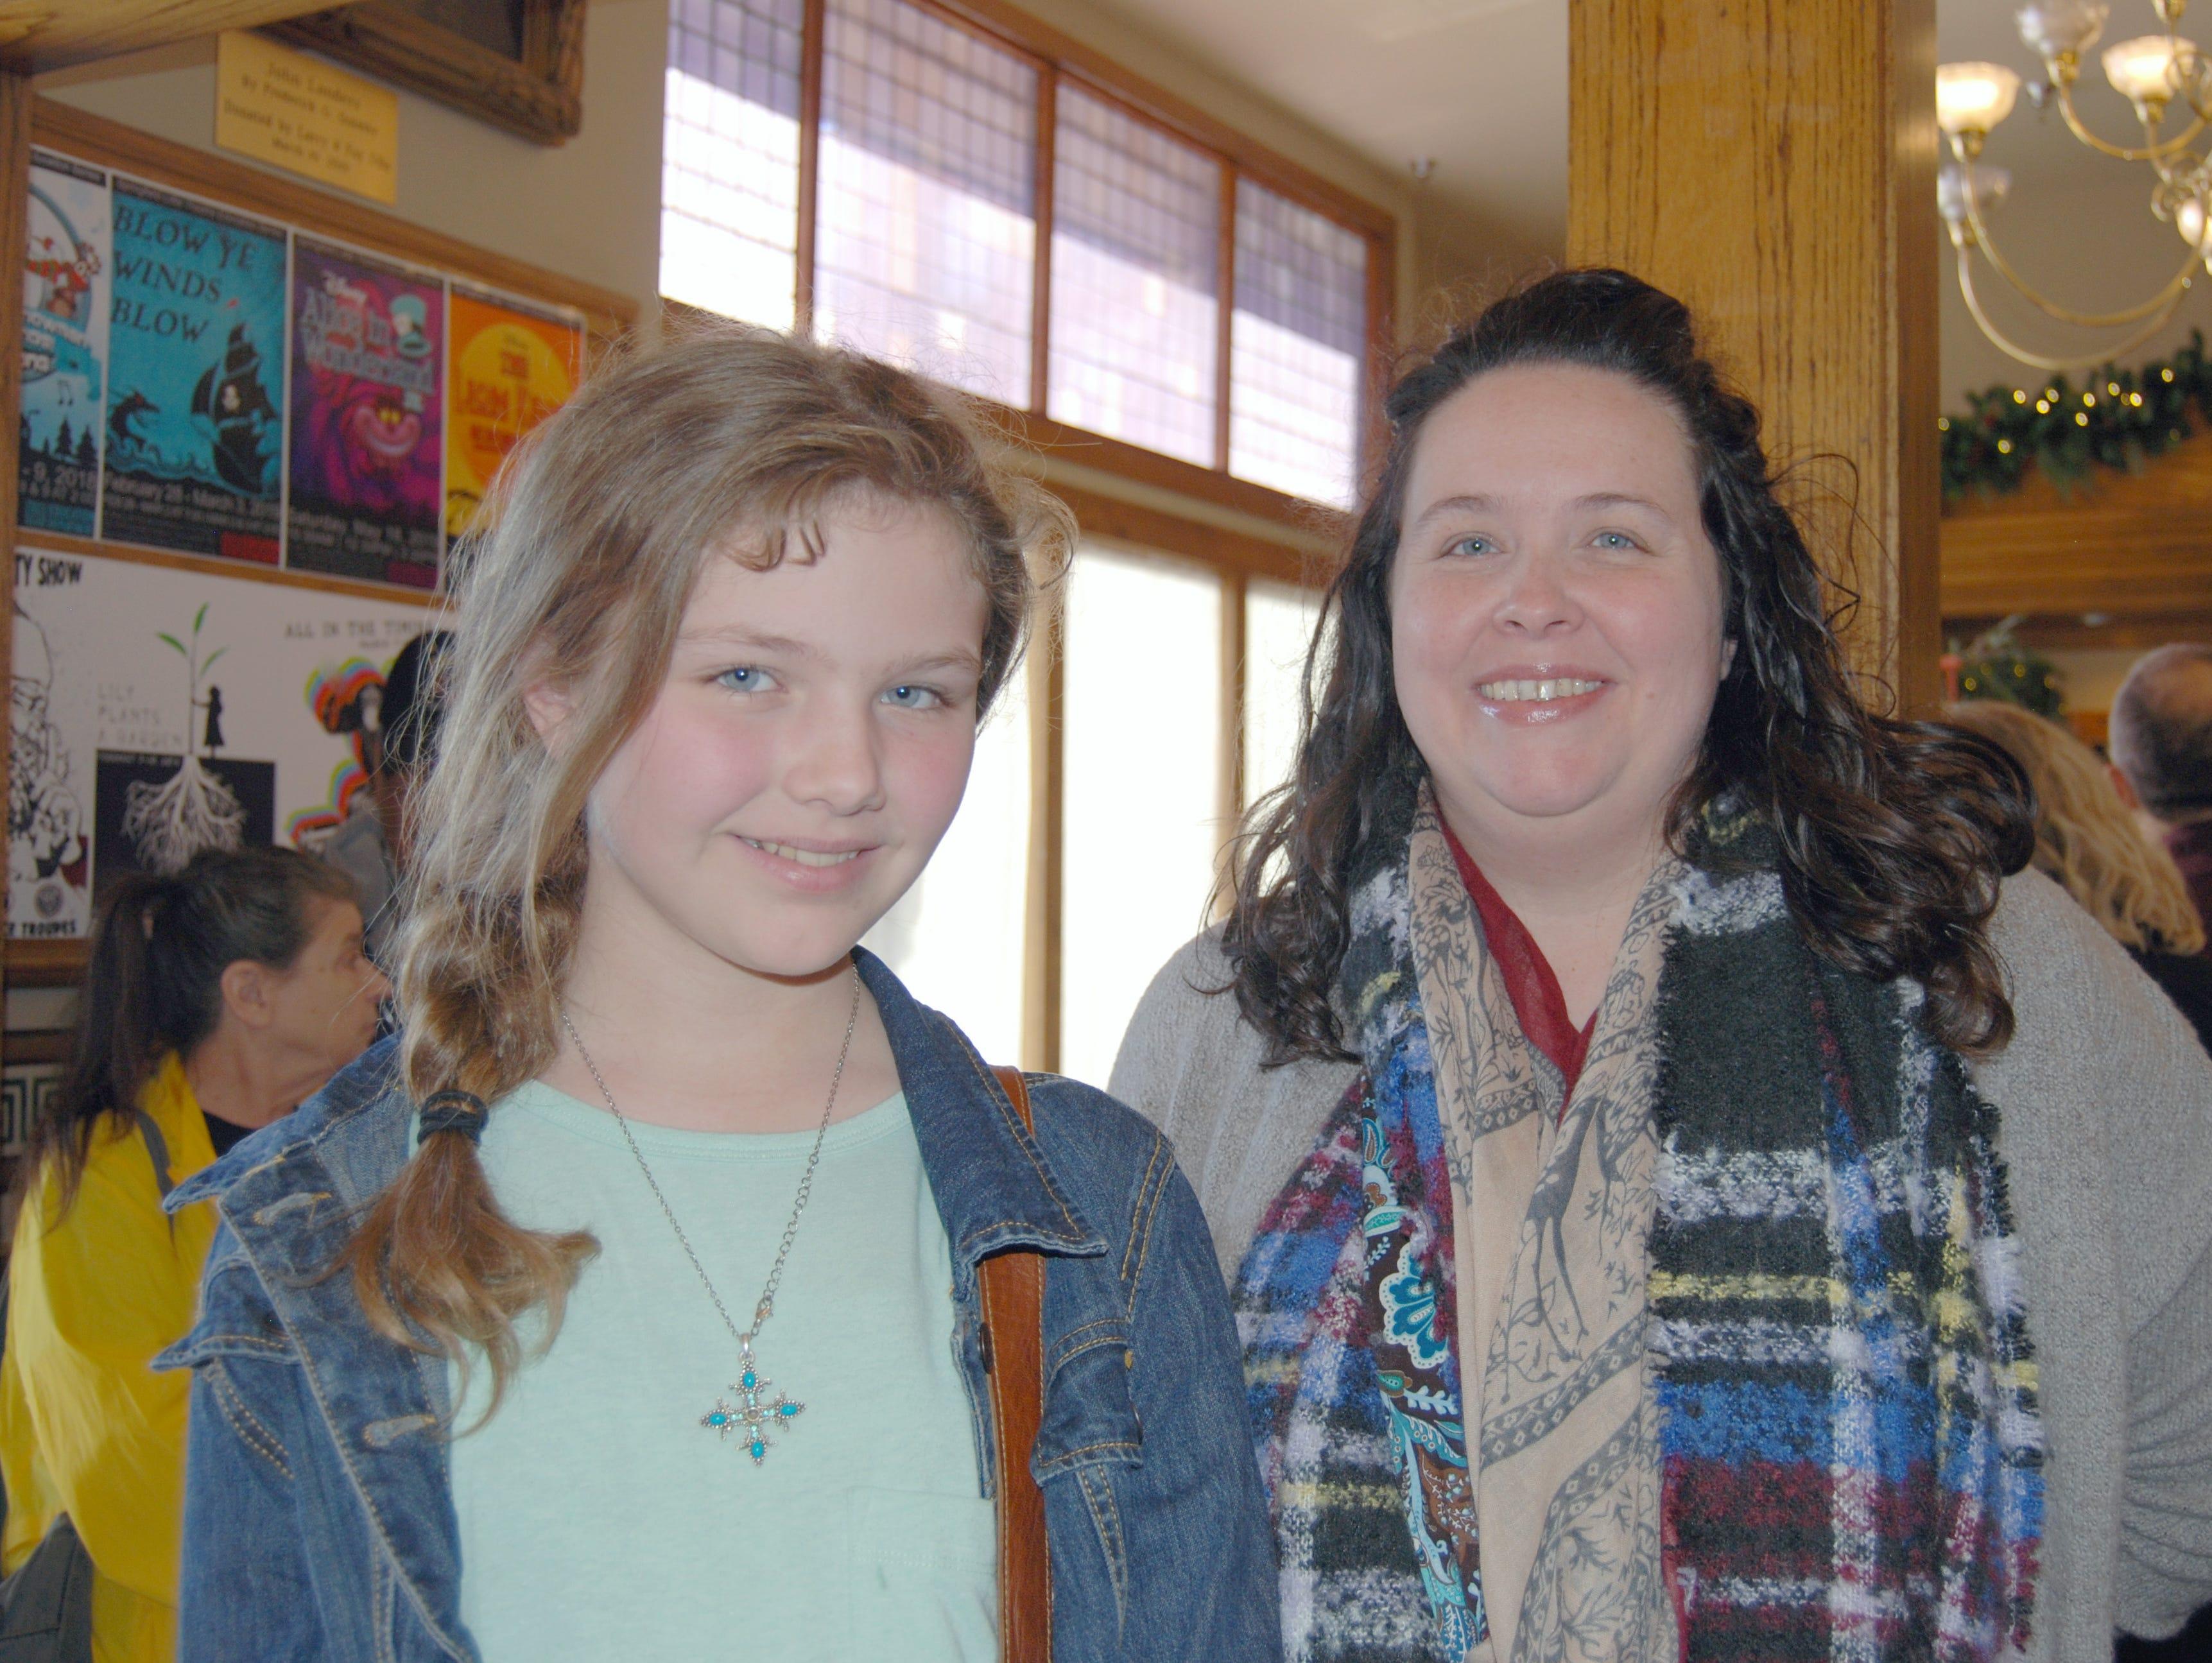 Lindsay and Tabitha McDonald